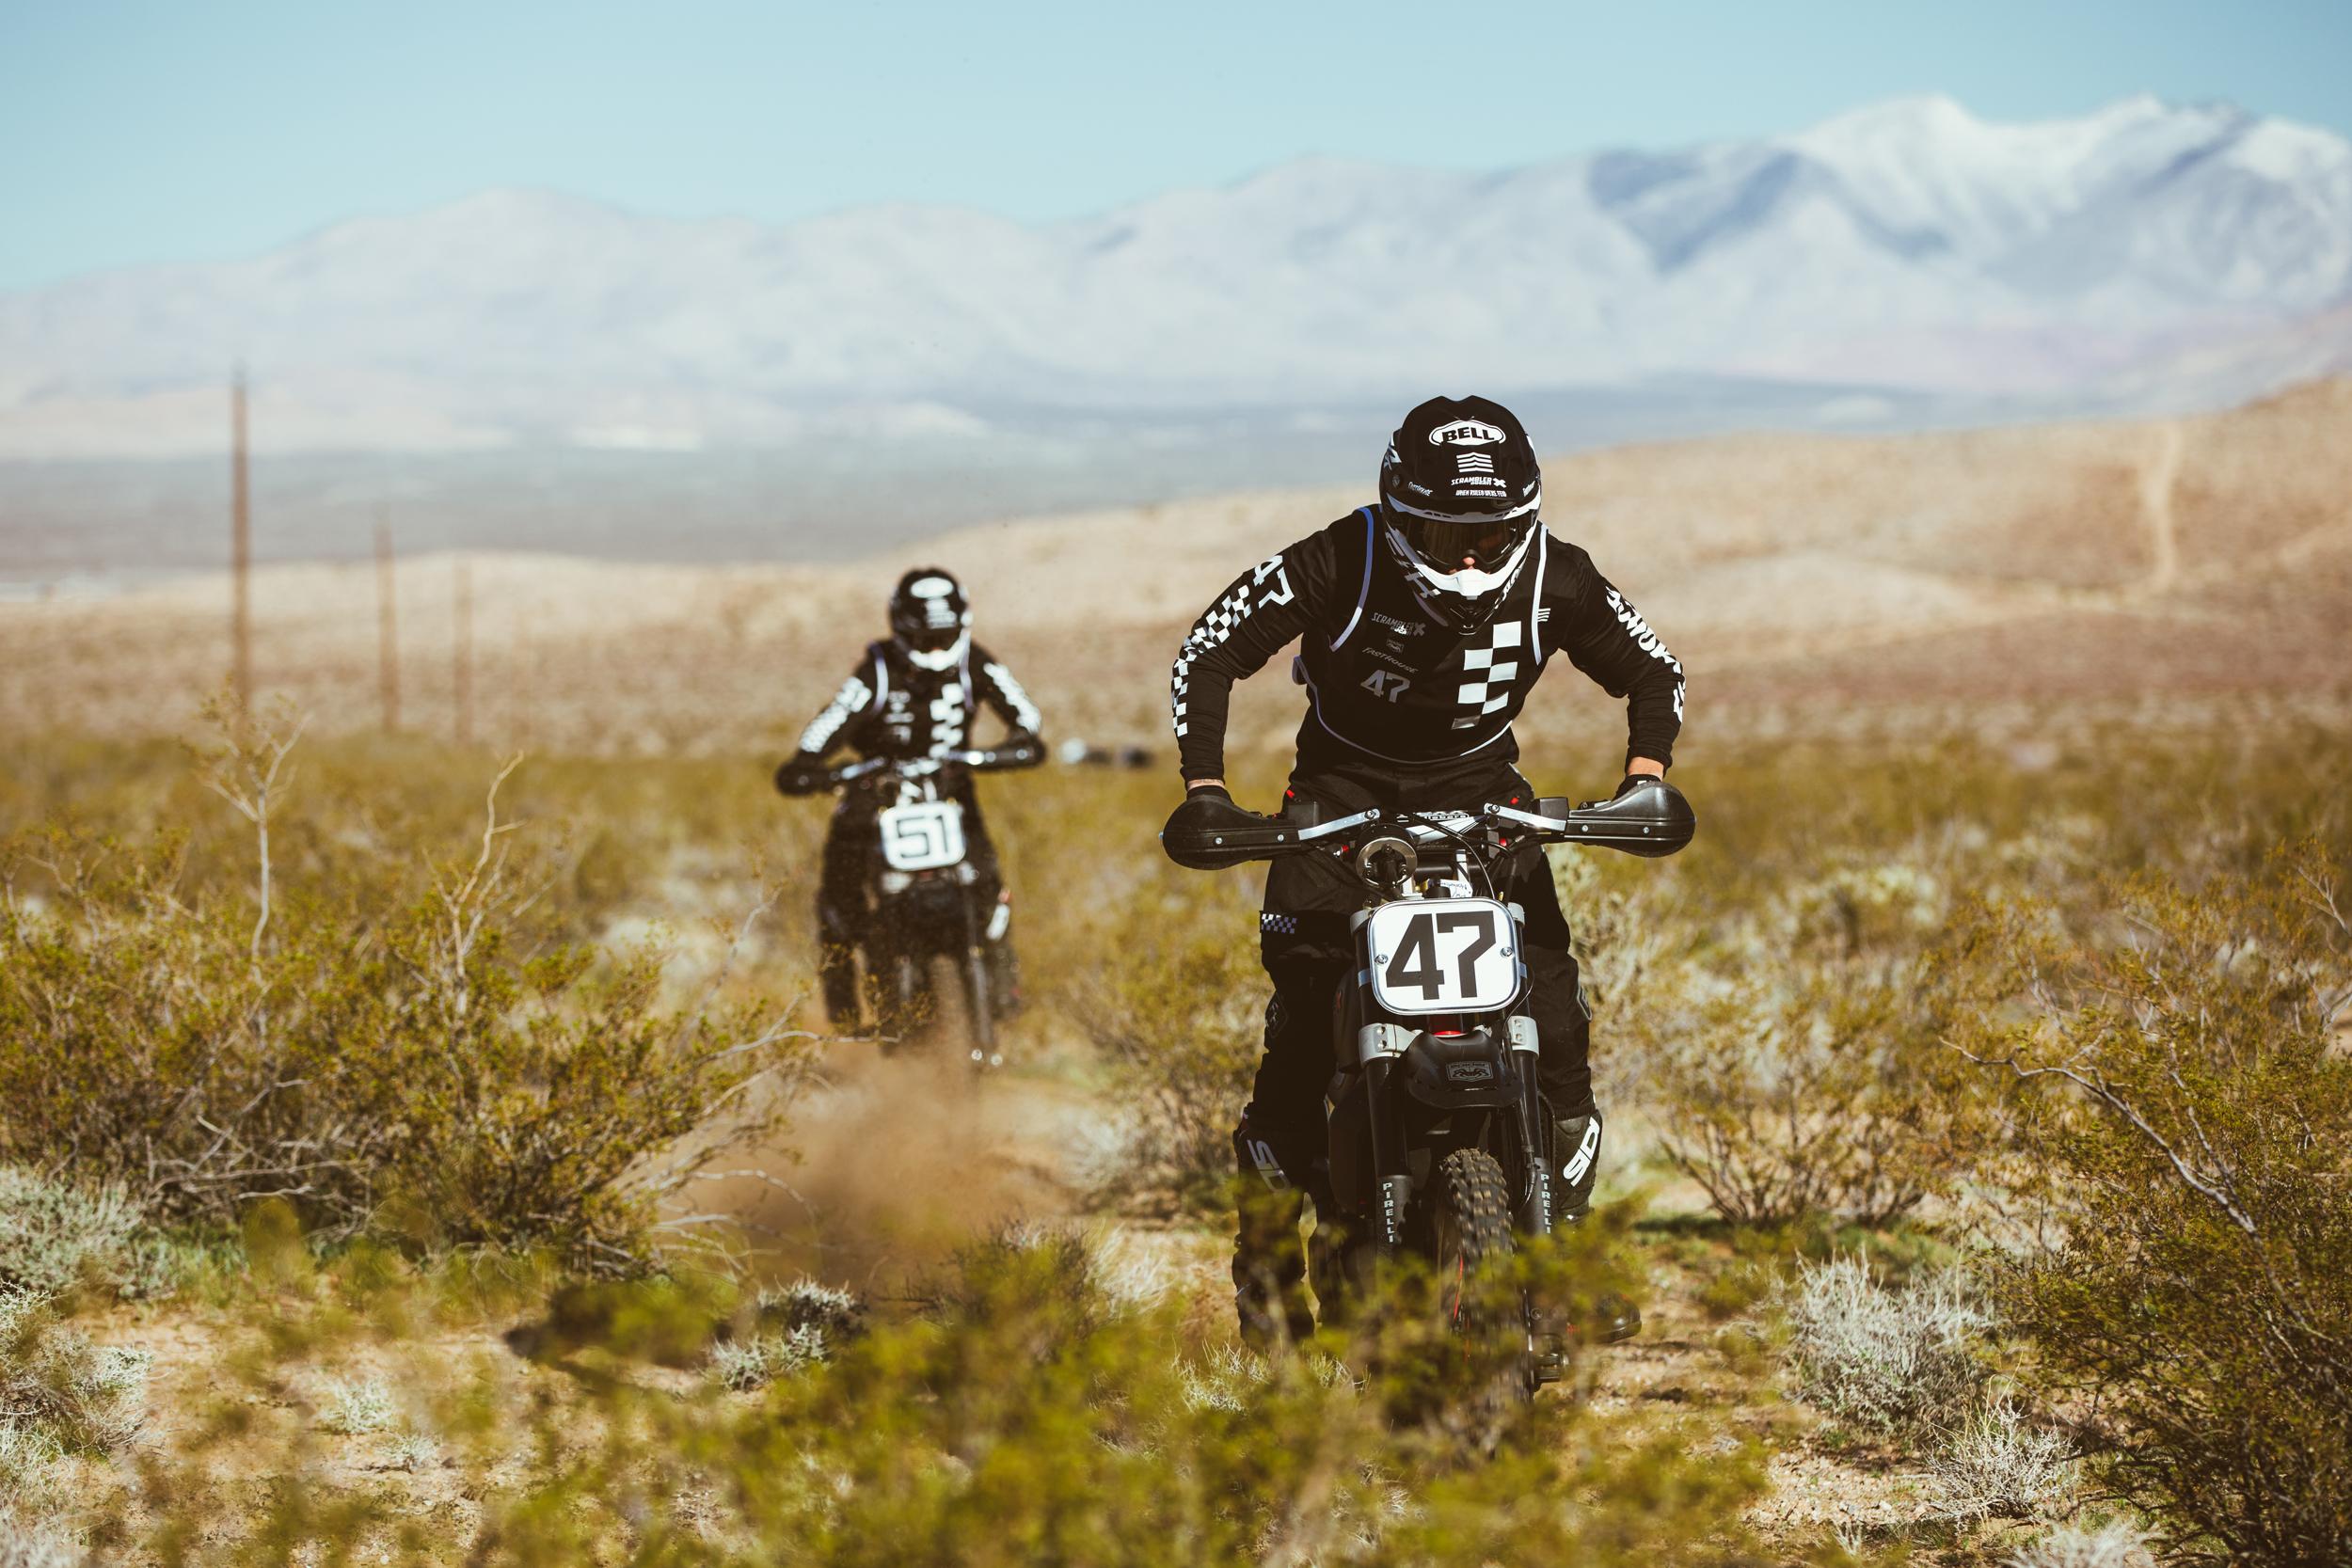 Scrambler Ducati Desert Sled Dominates Inaugural Mint 400 Hooligan Class [2]